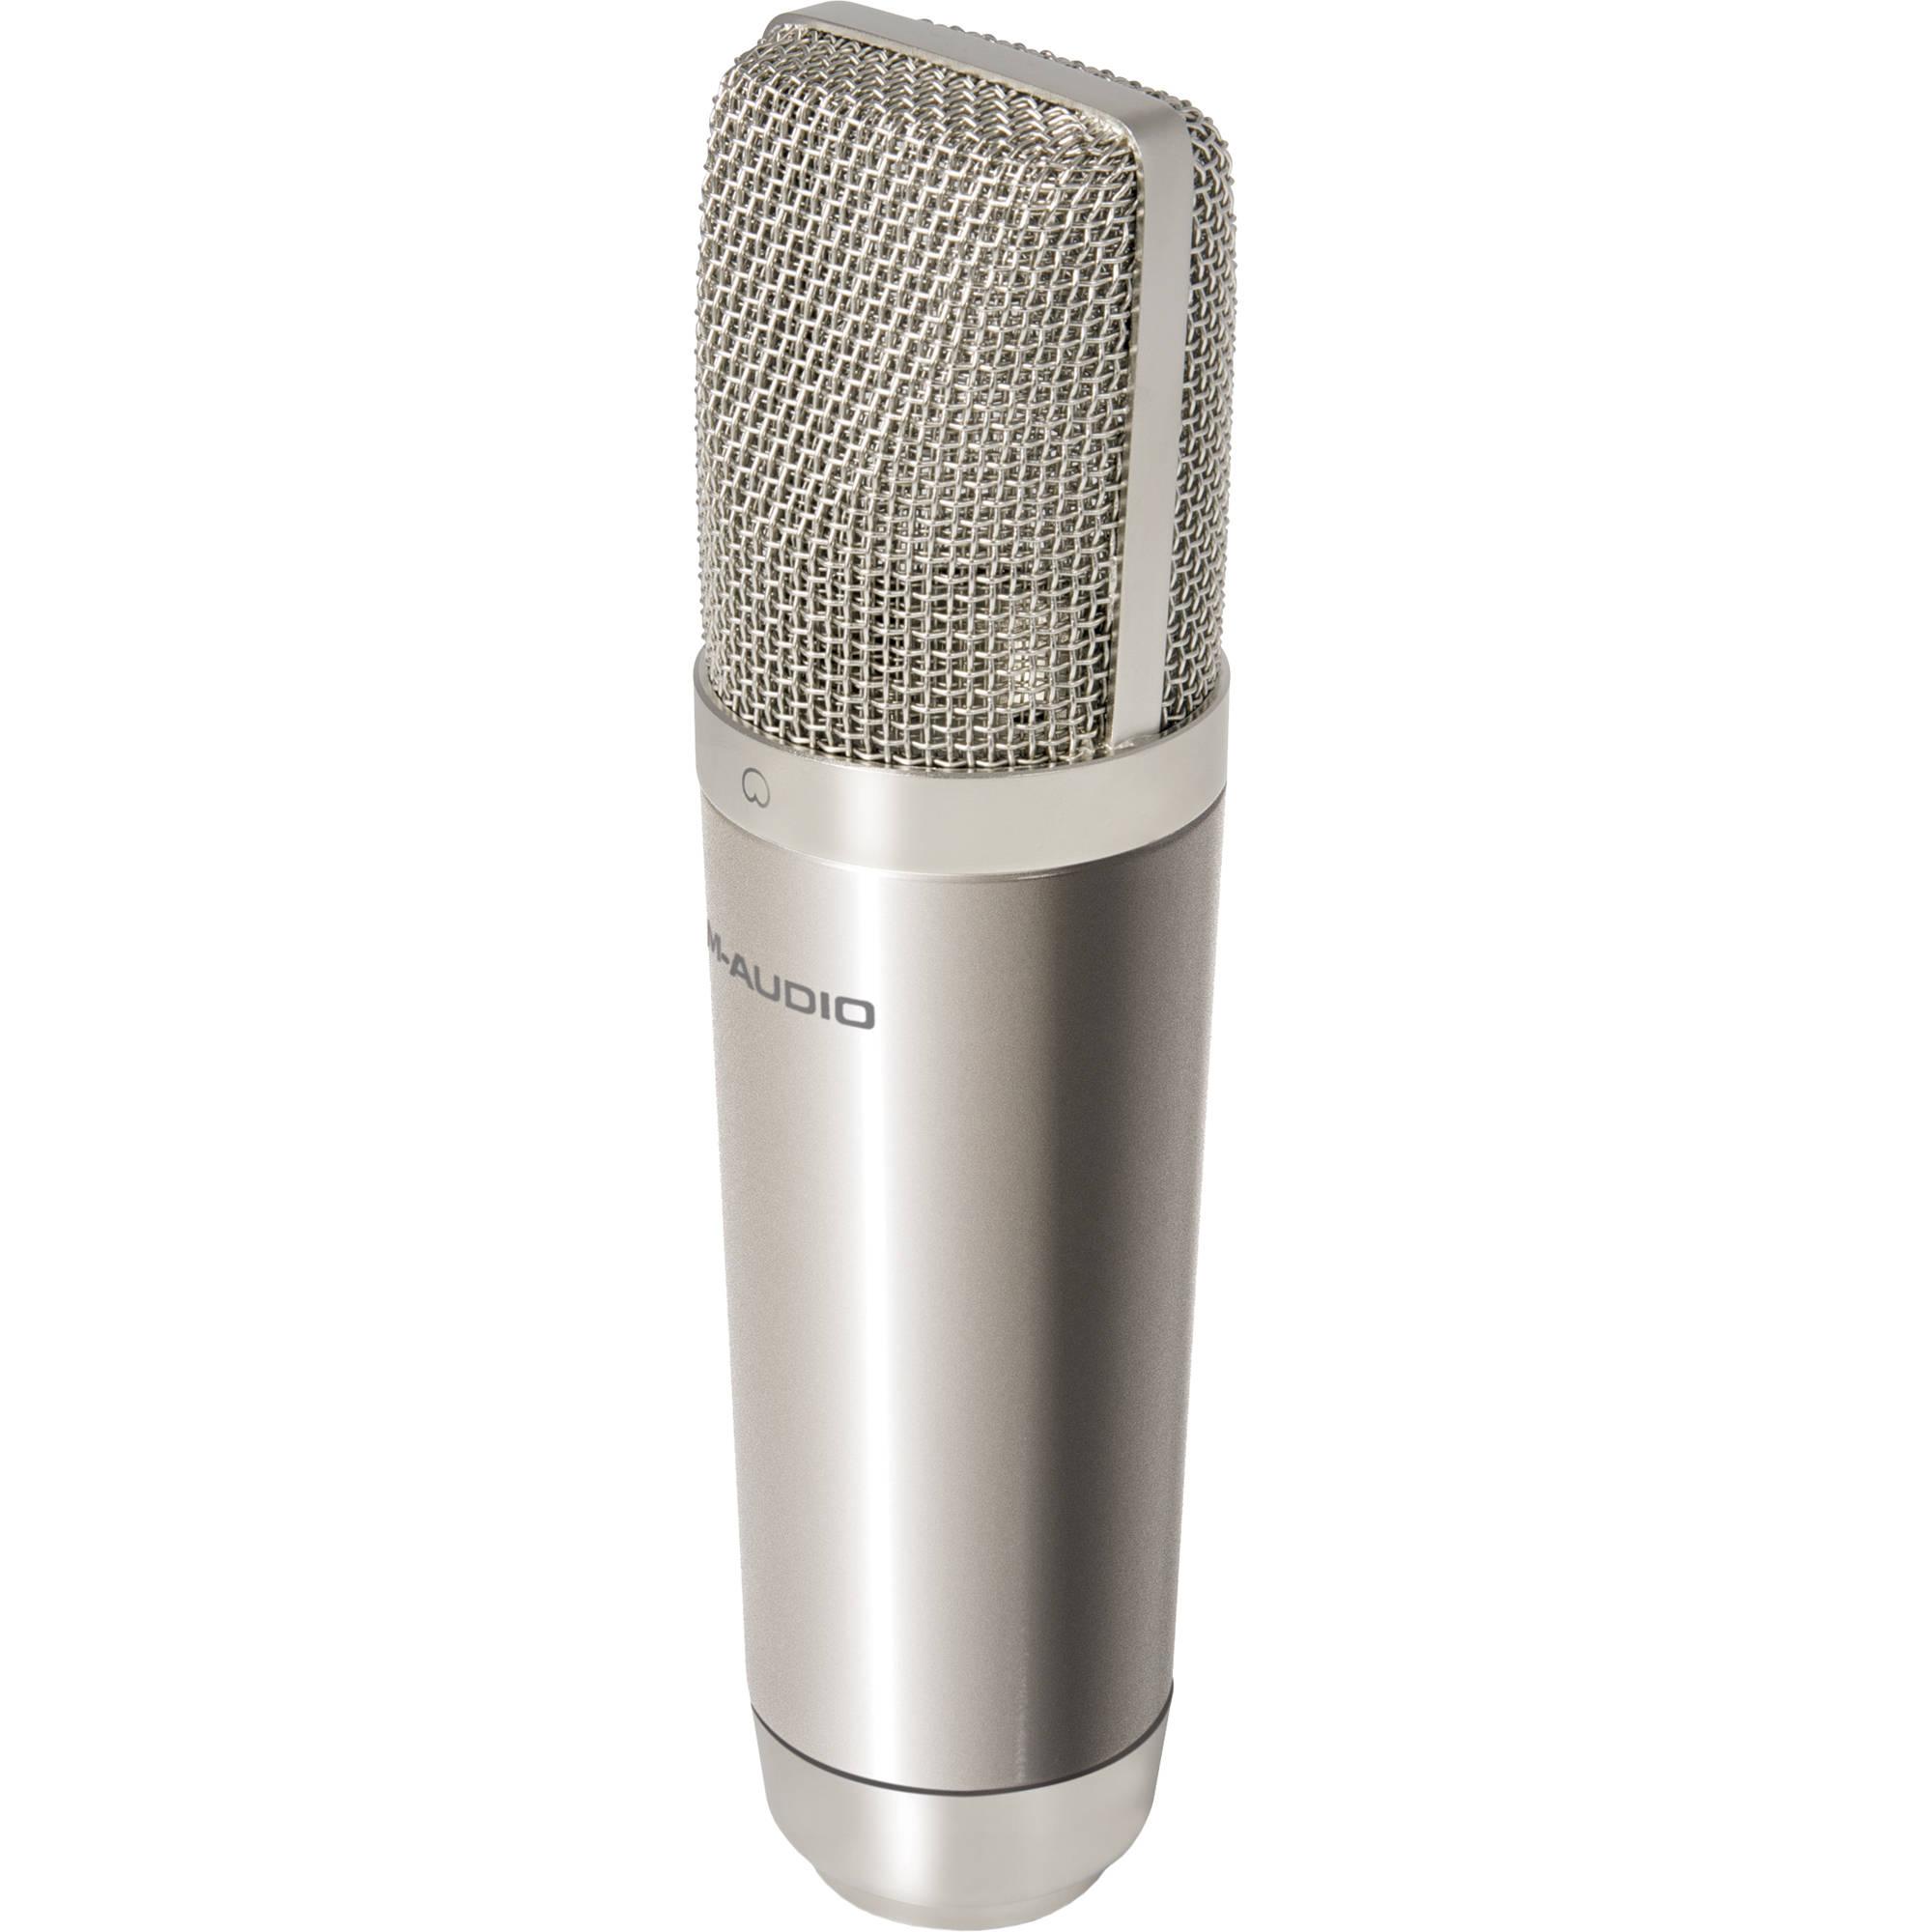 m audio nova large capsule condenser microphone nova b h photo